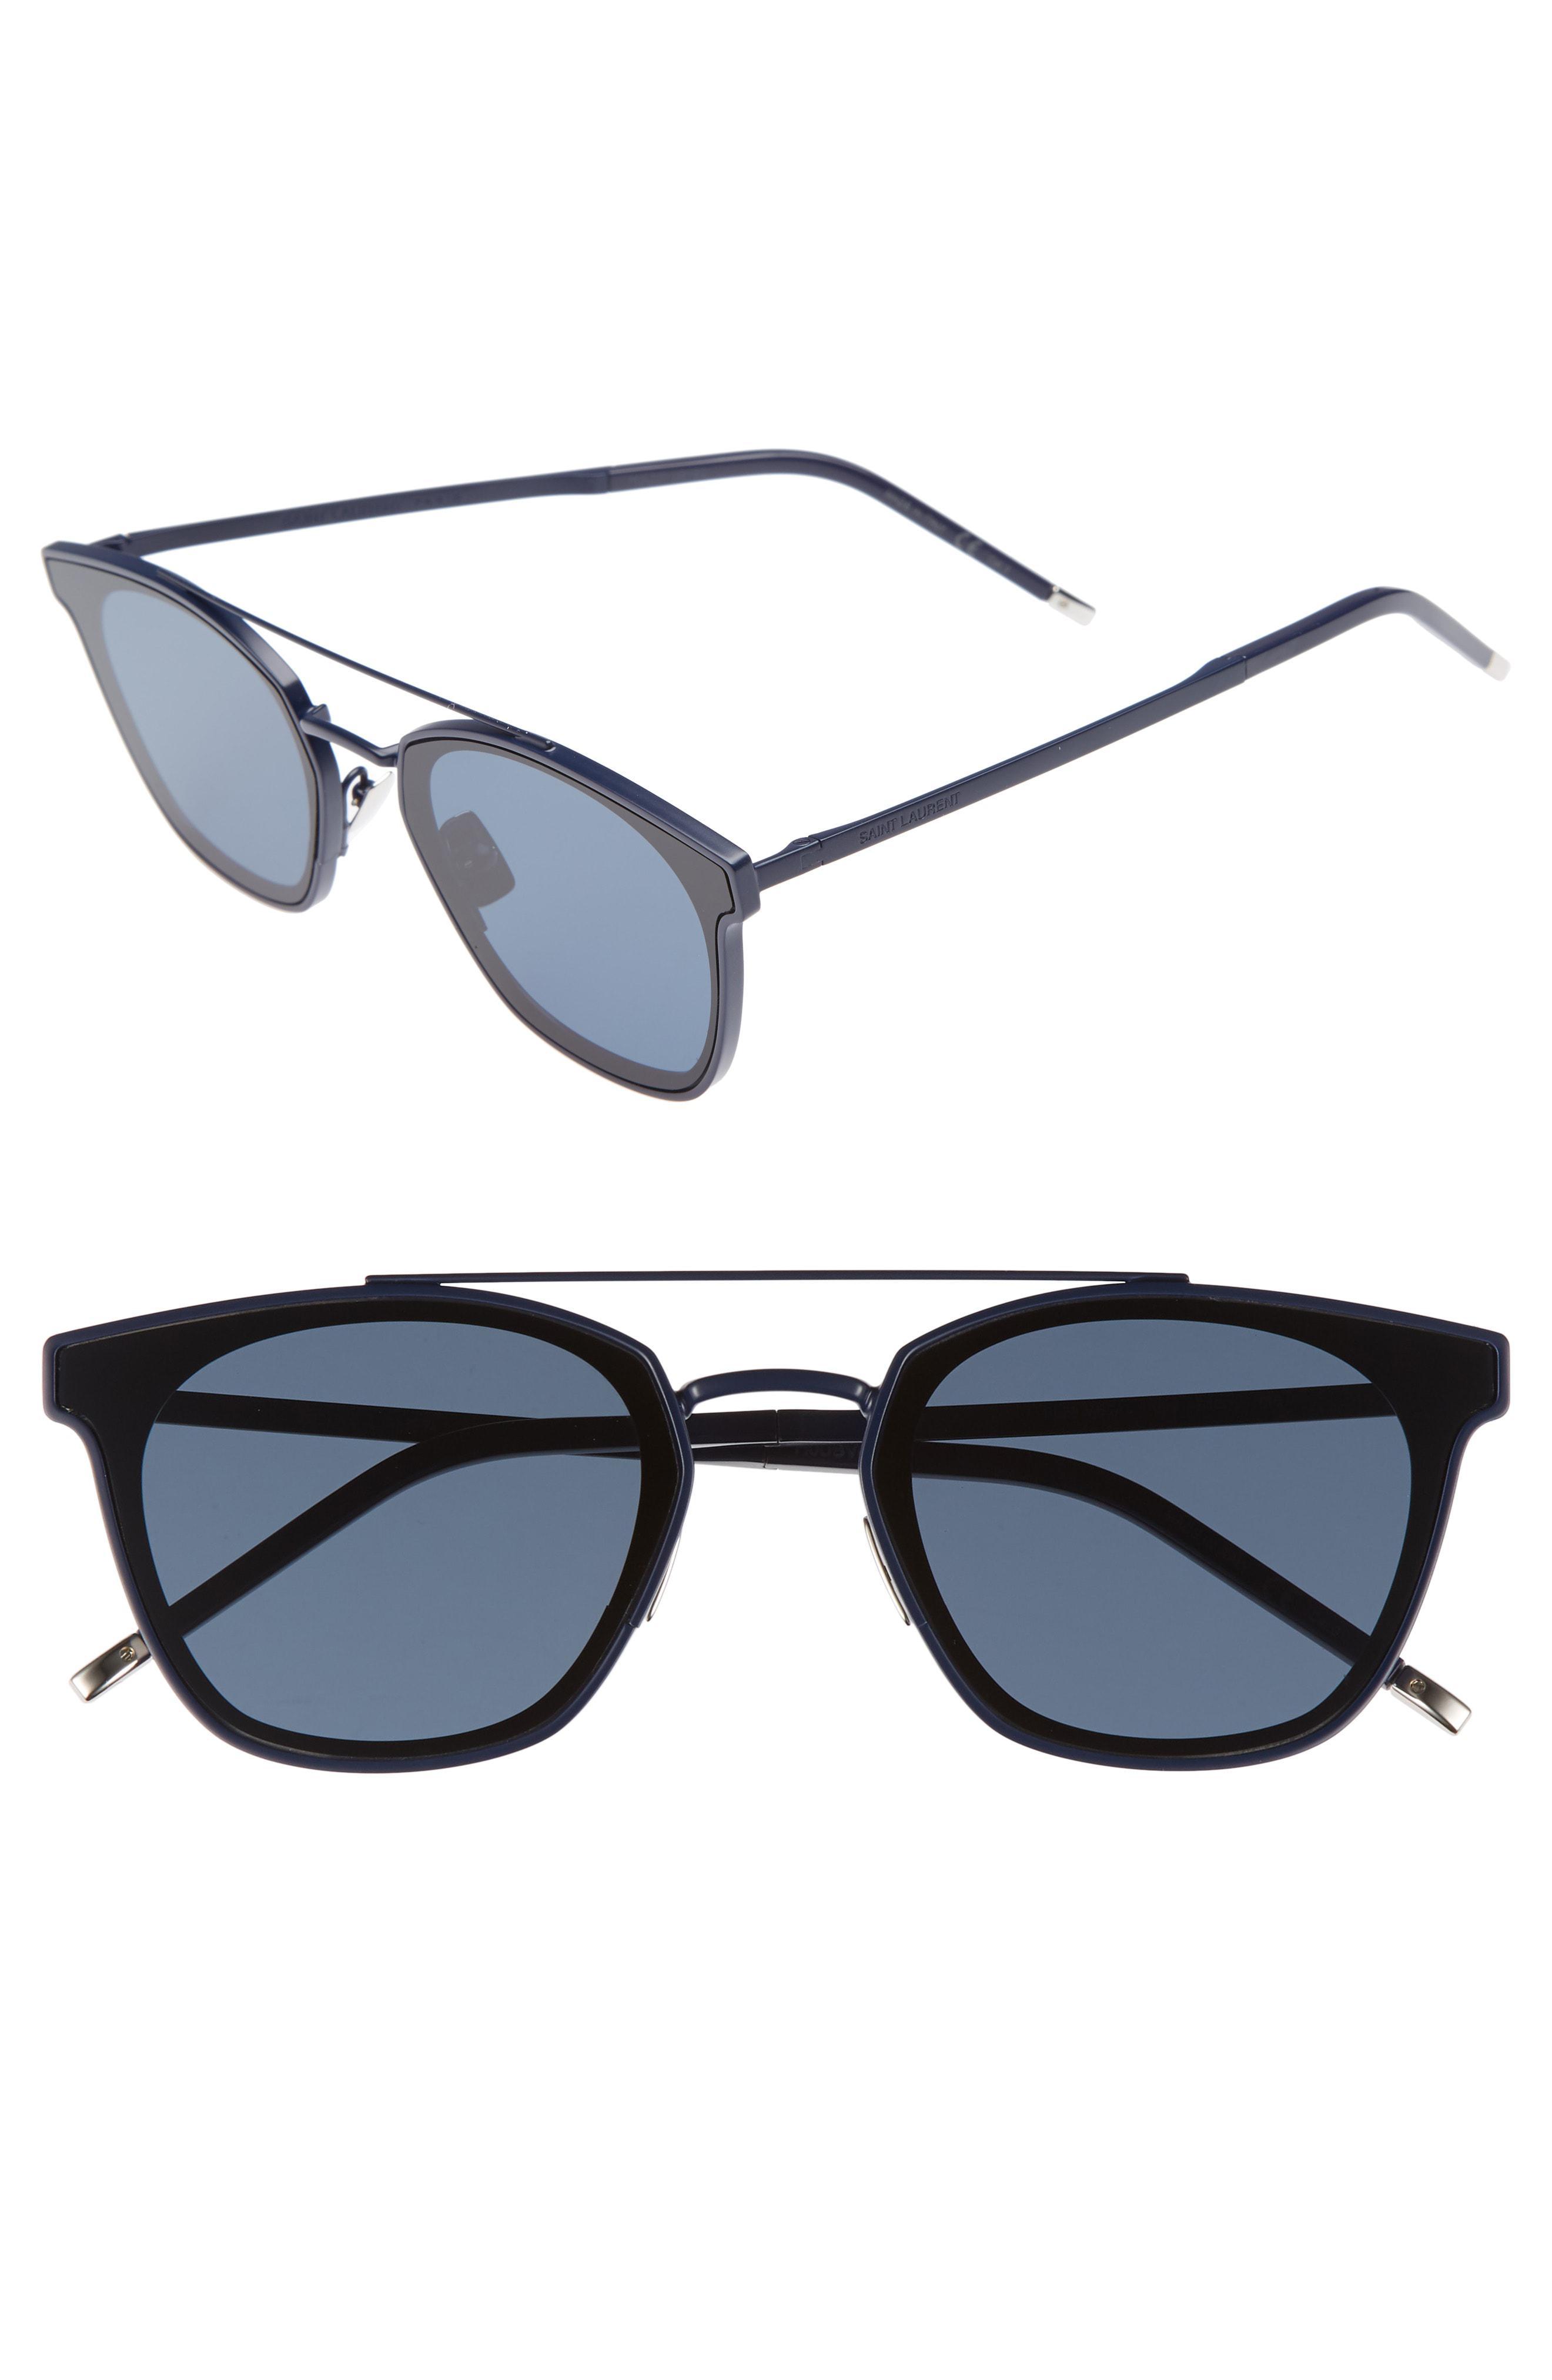 266d811fae22 Lyst - Saint Laurent Sl 28 61mm Polarized Sunglasses - in Brown for Men